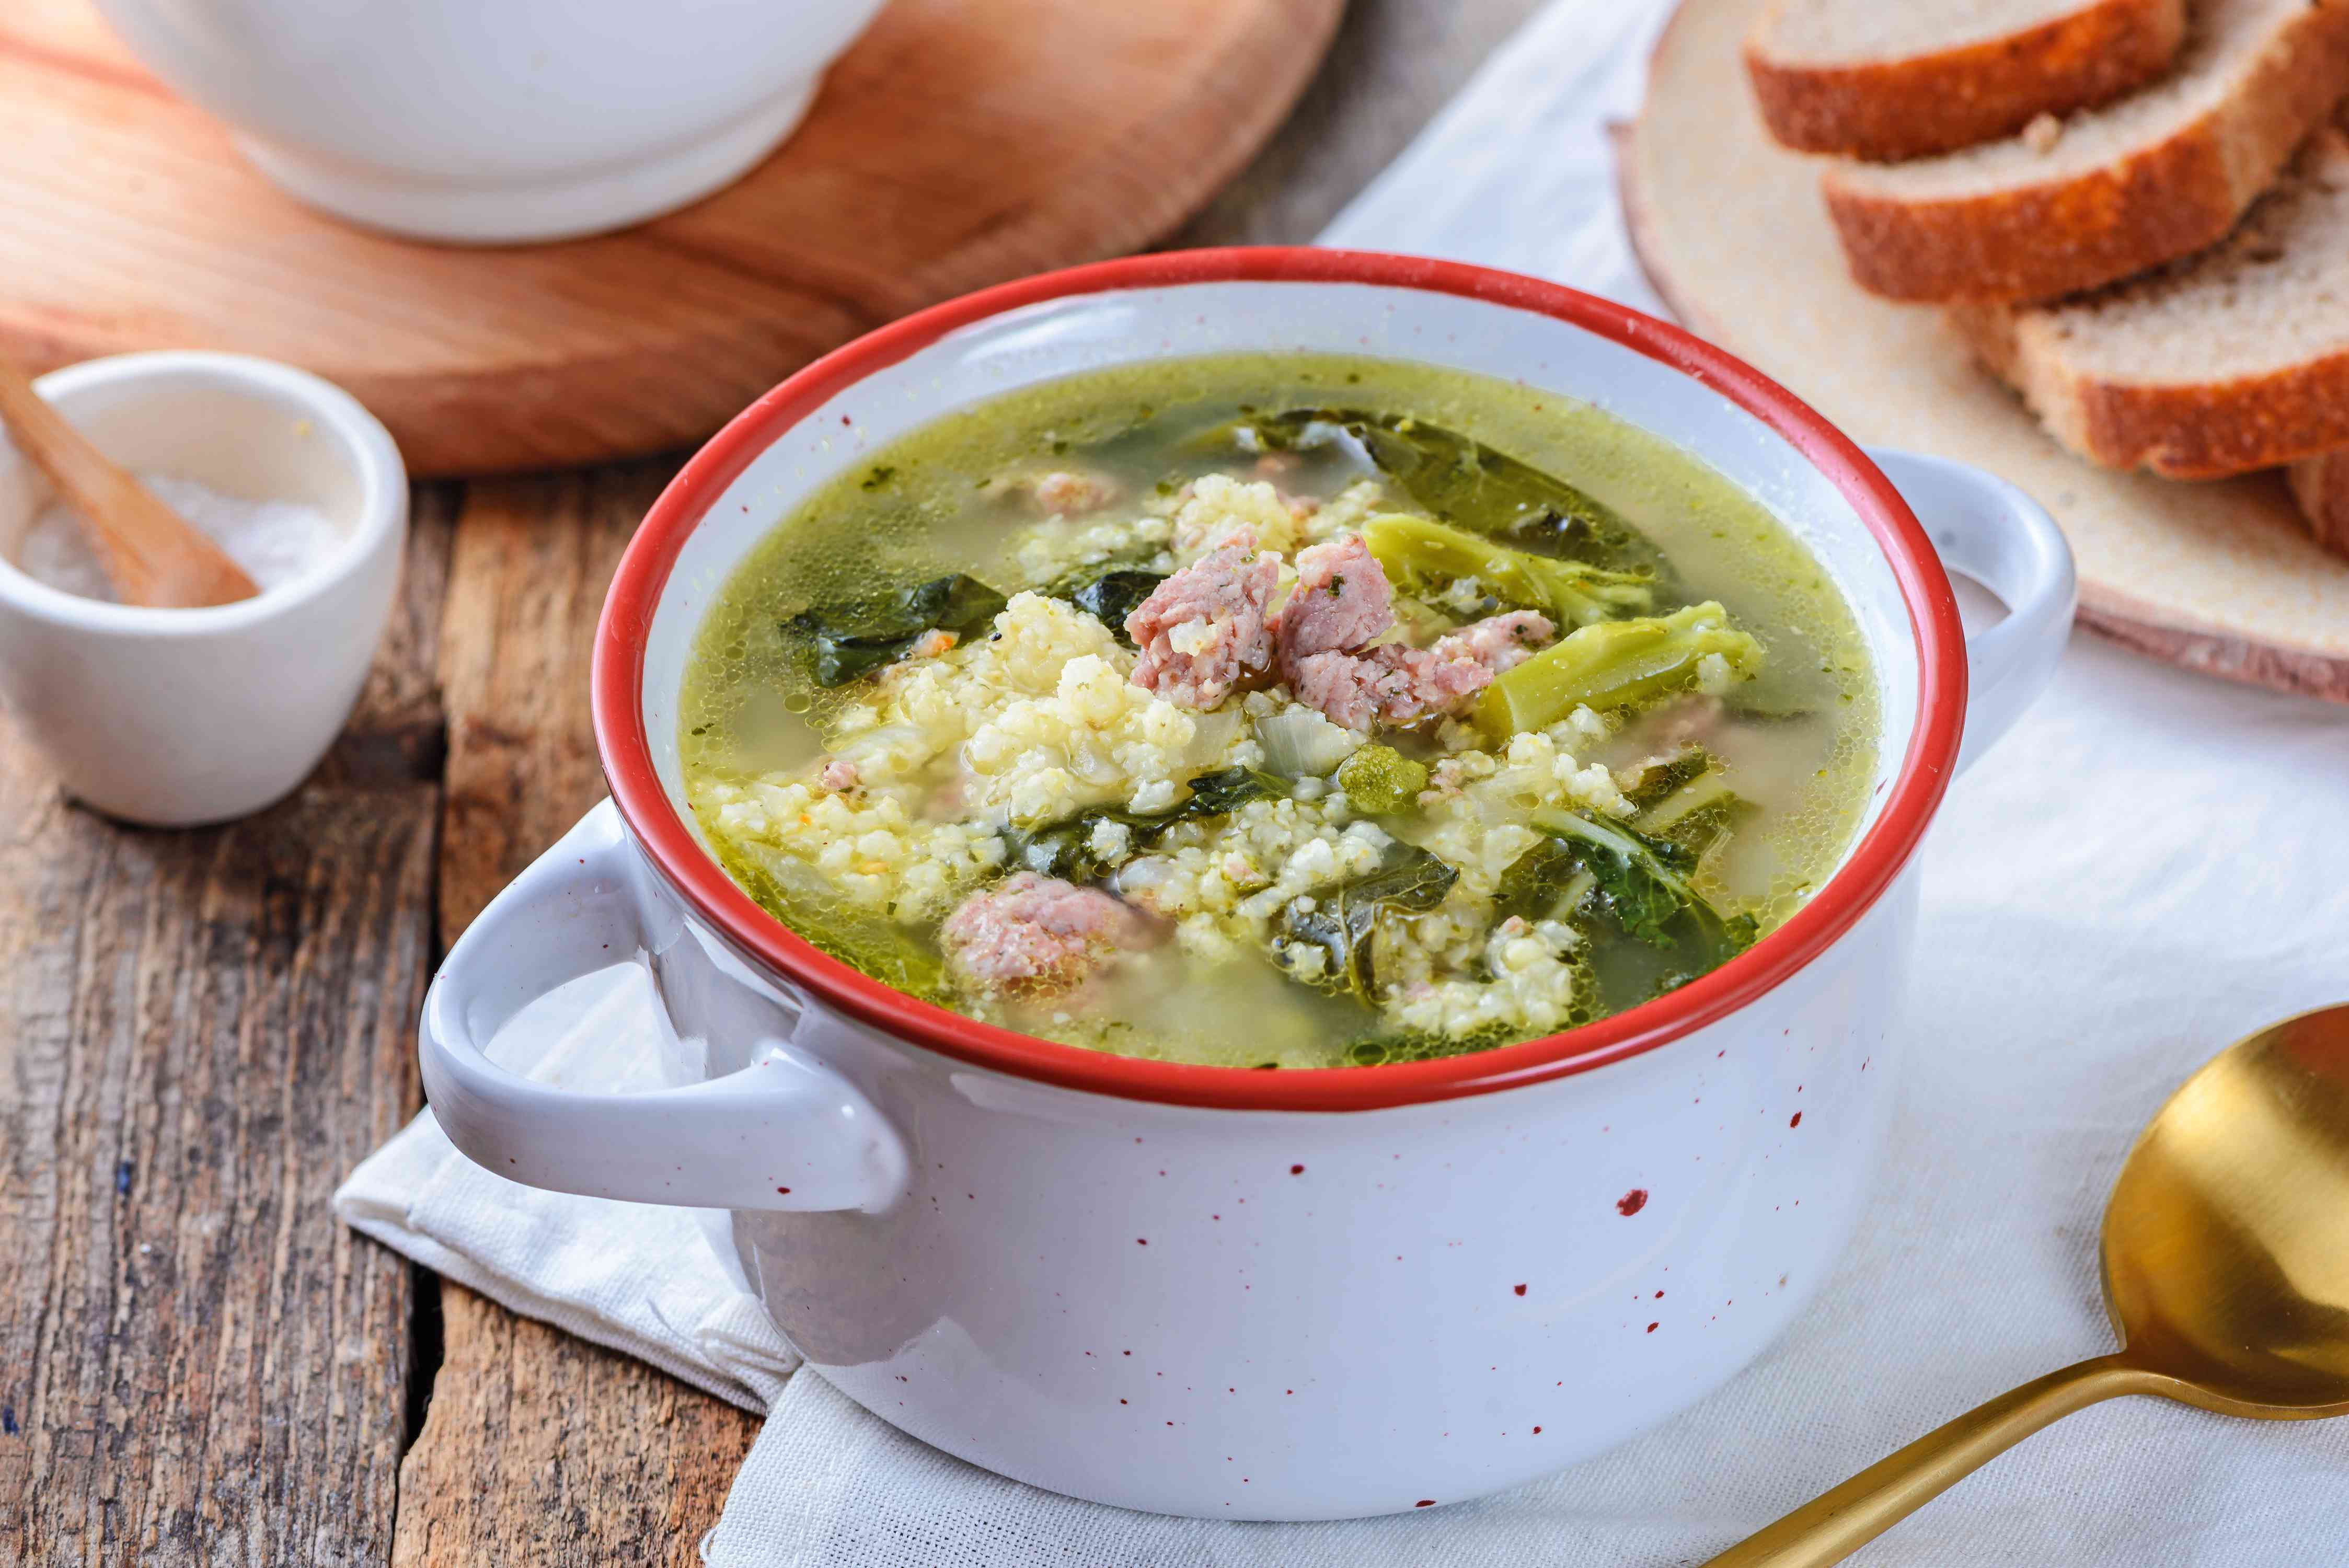 Turkey sausage broccoli rabe recipe